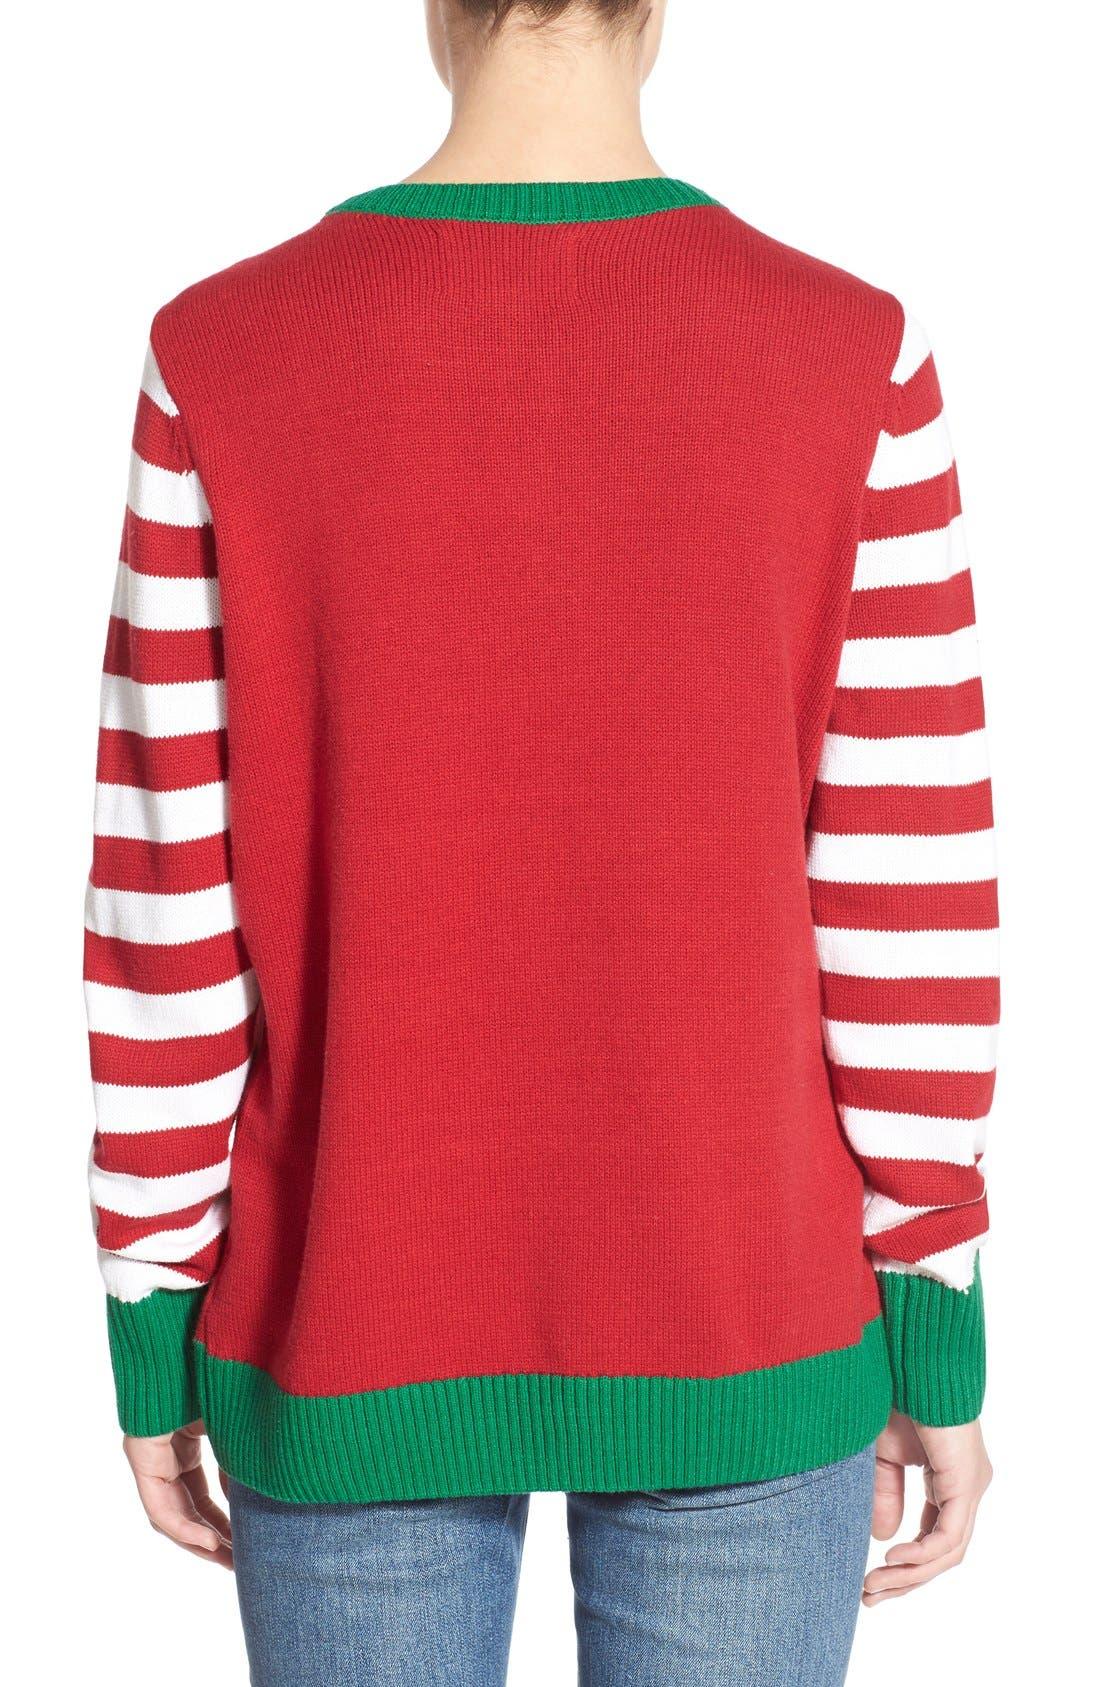 Alternate Image 2  - Ugly Christmas Sweater Light-Up Christmas Tree Sweater